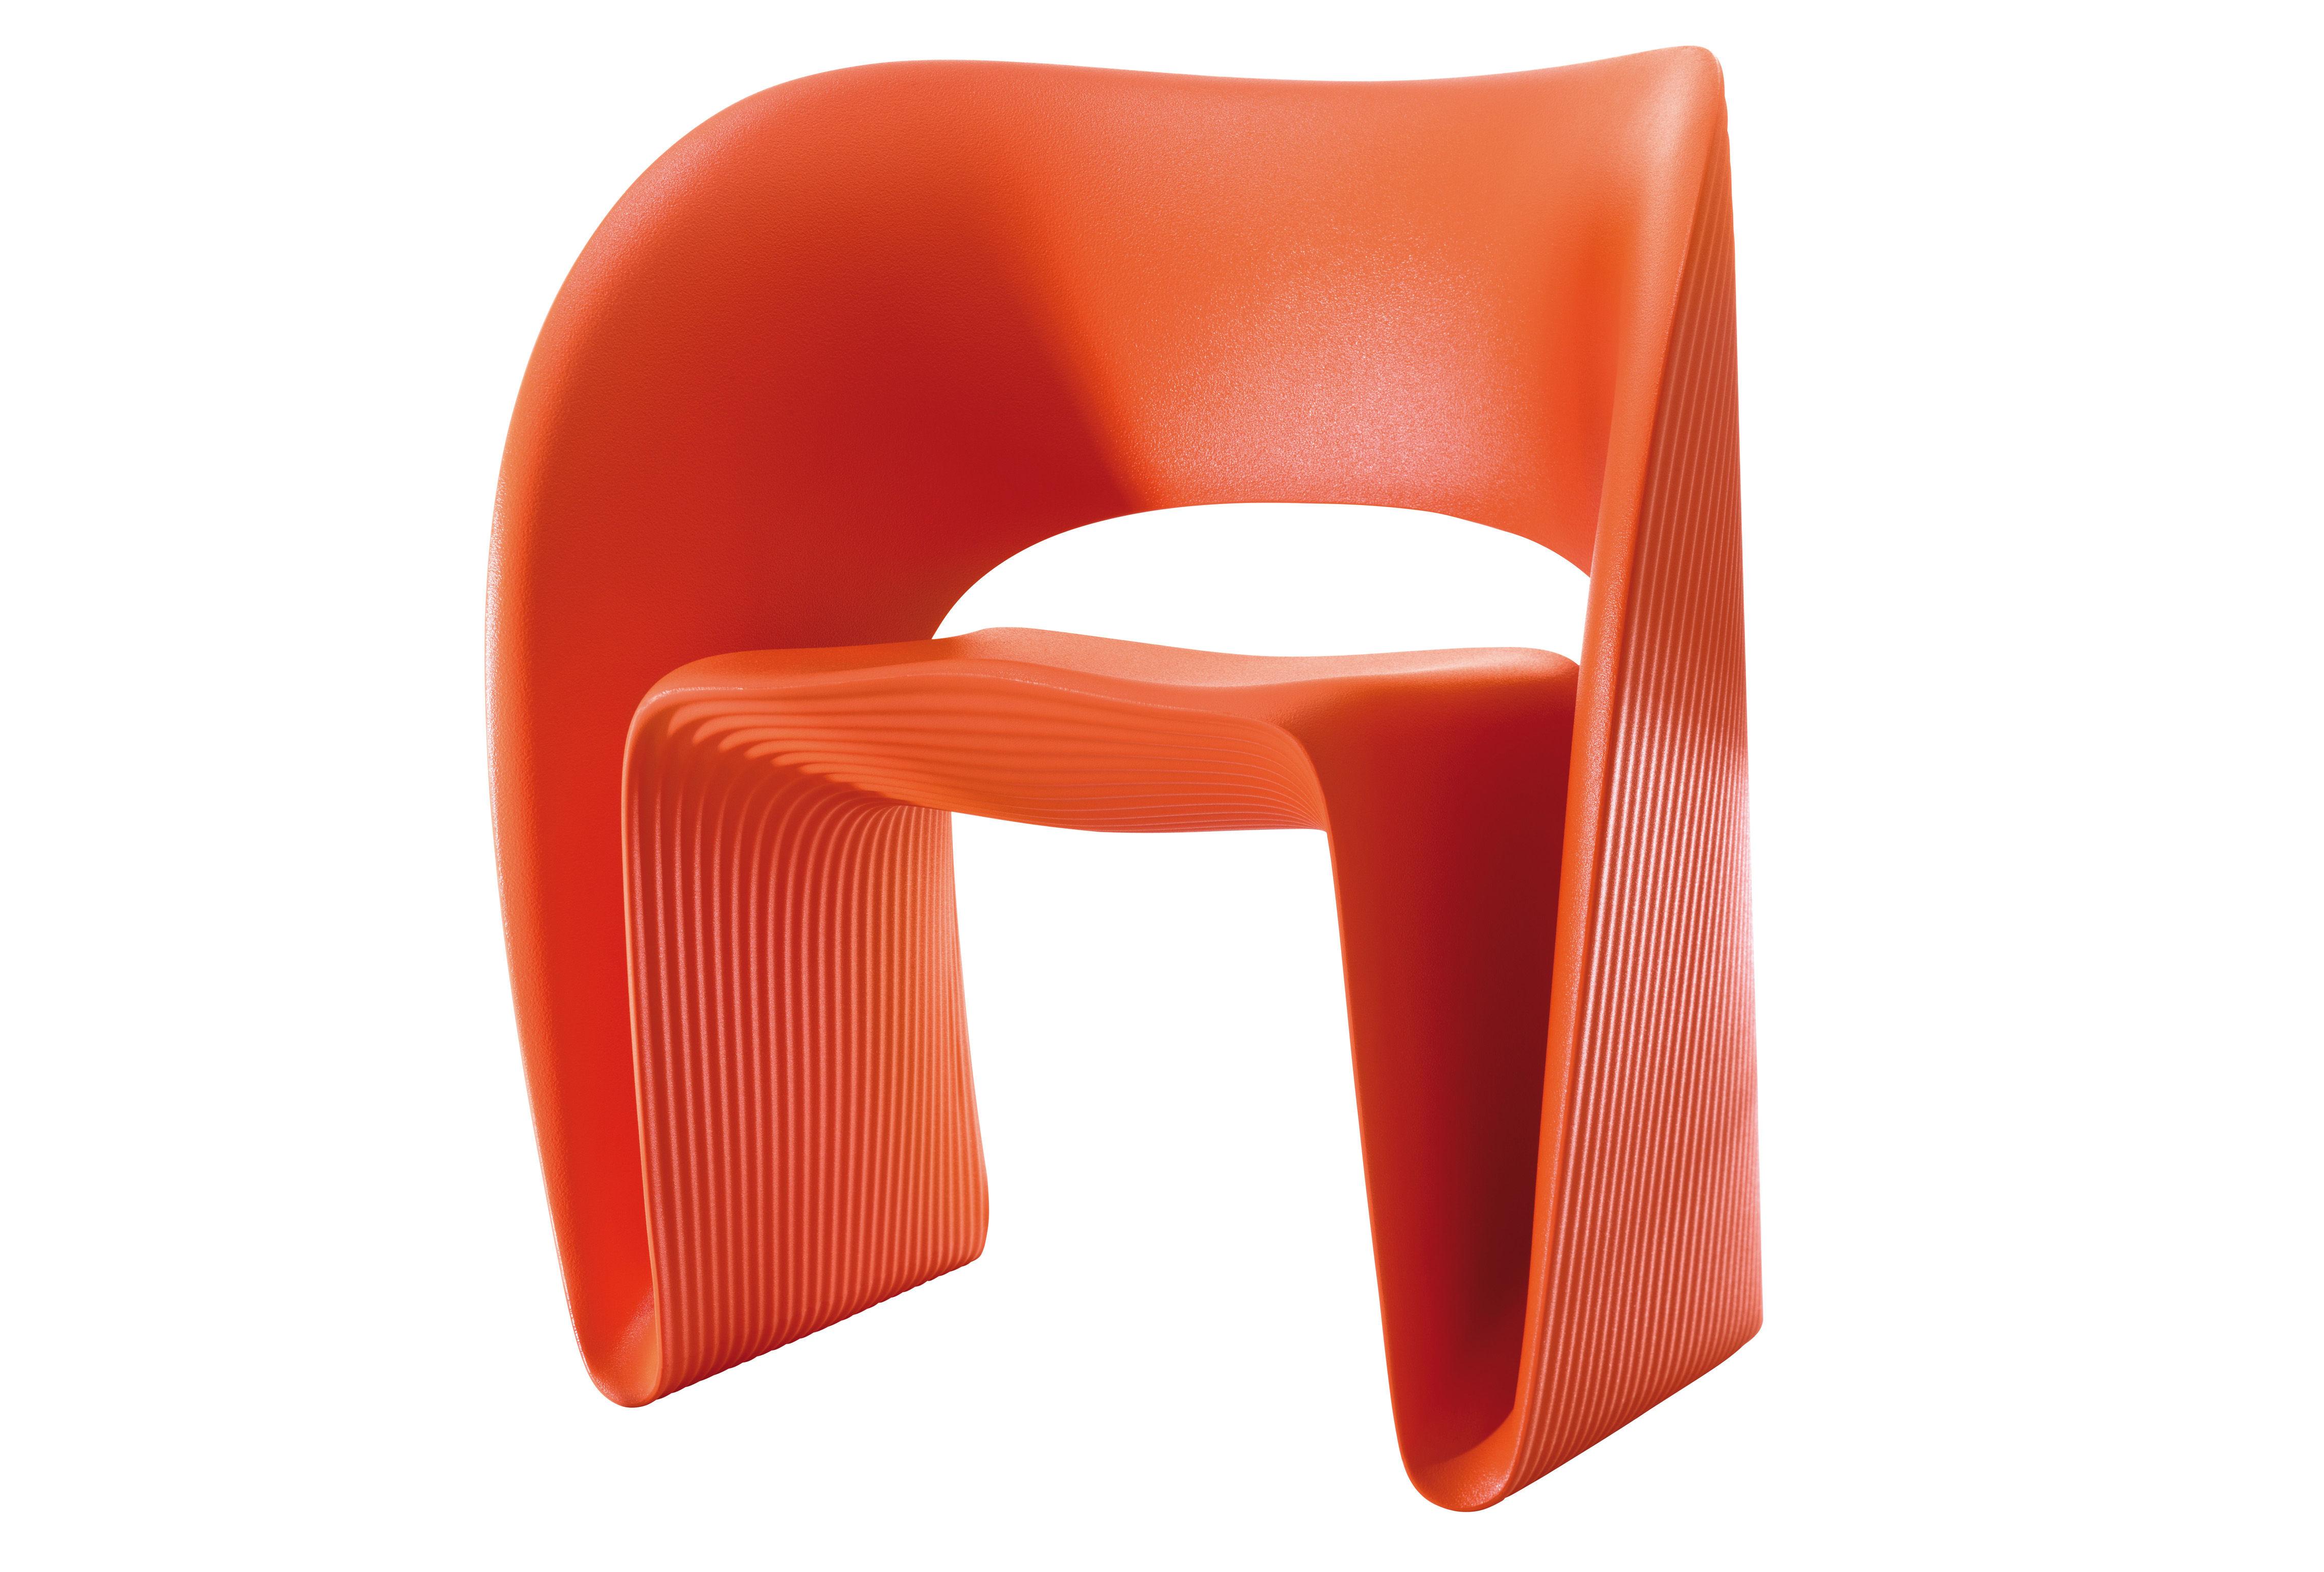 Möbel - Stühle  - Raviolo Sessel - Magis - Orange - rotationsgeformtes Polyäthylen